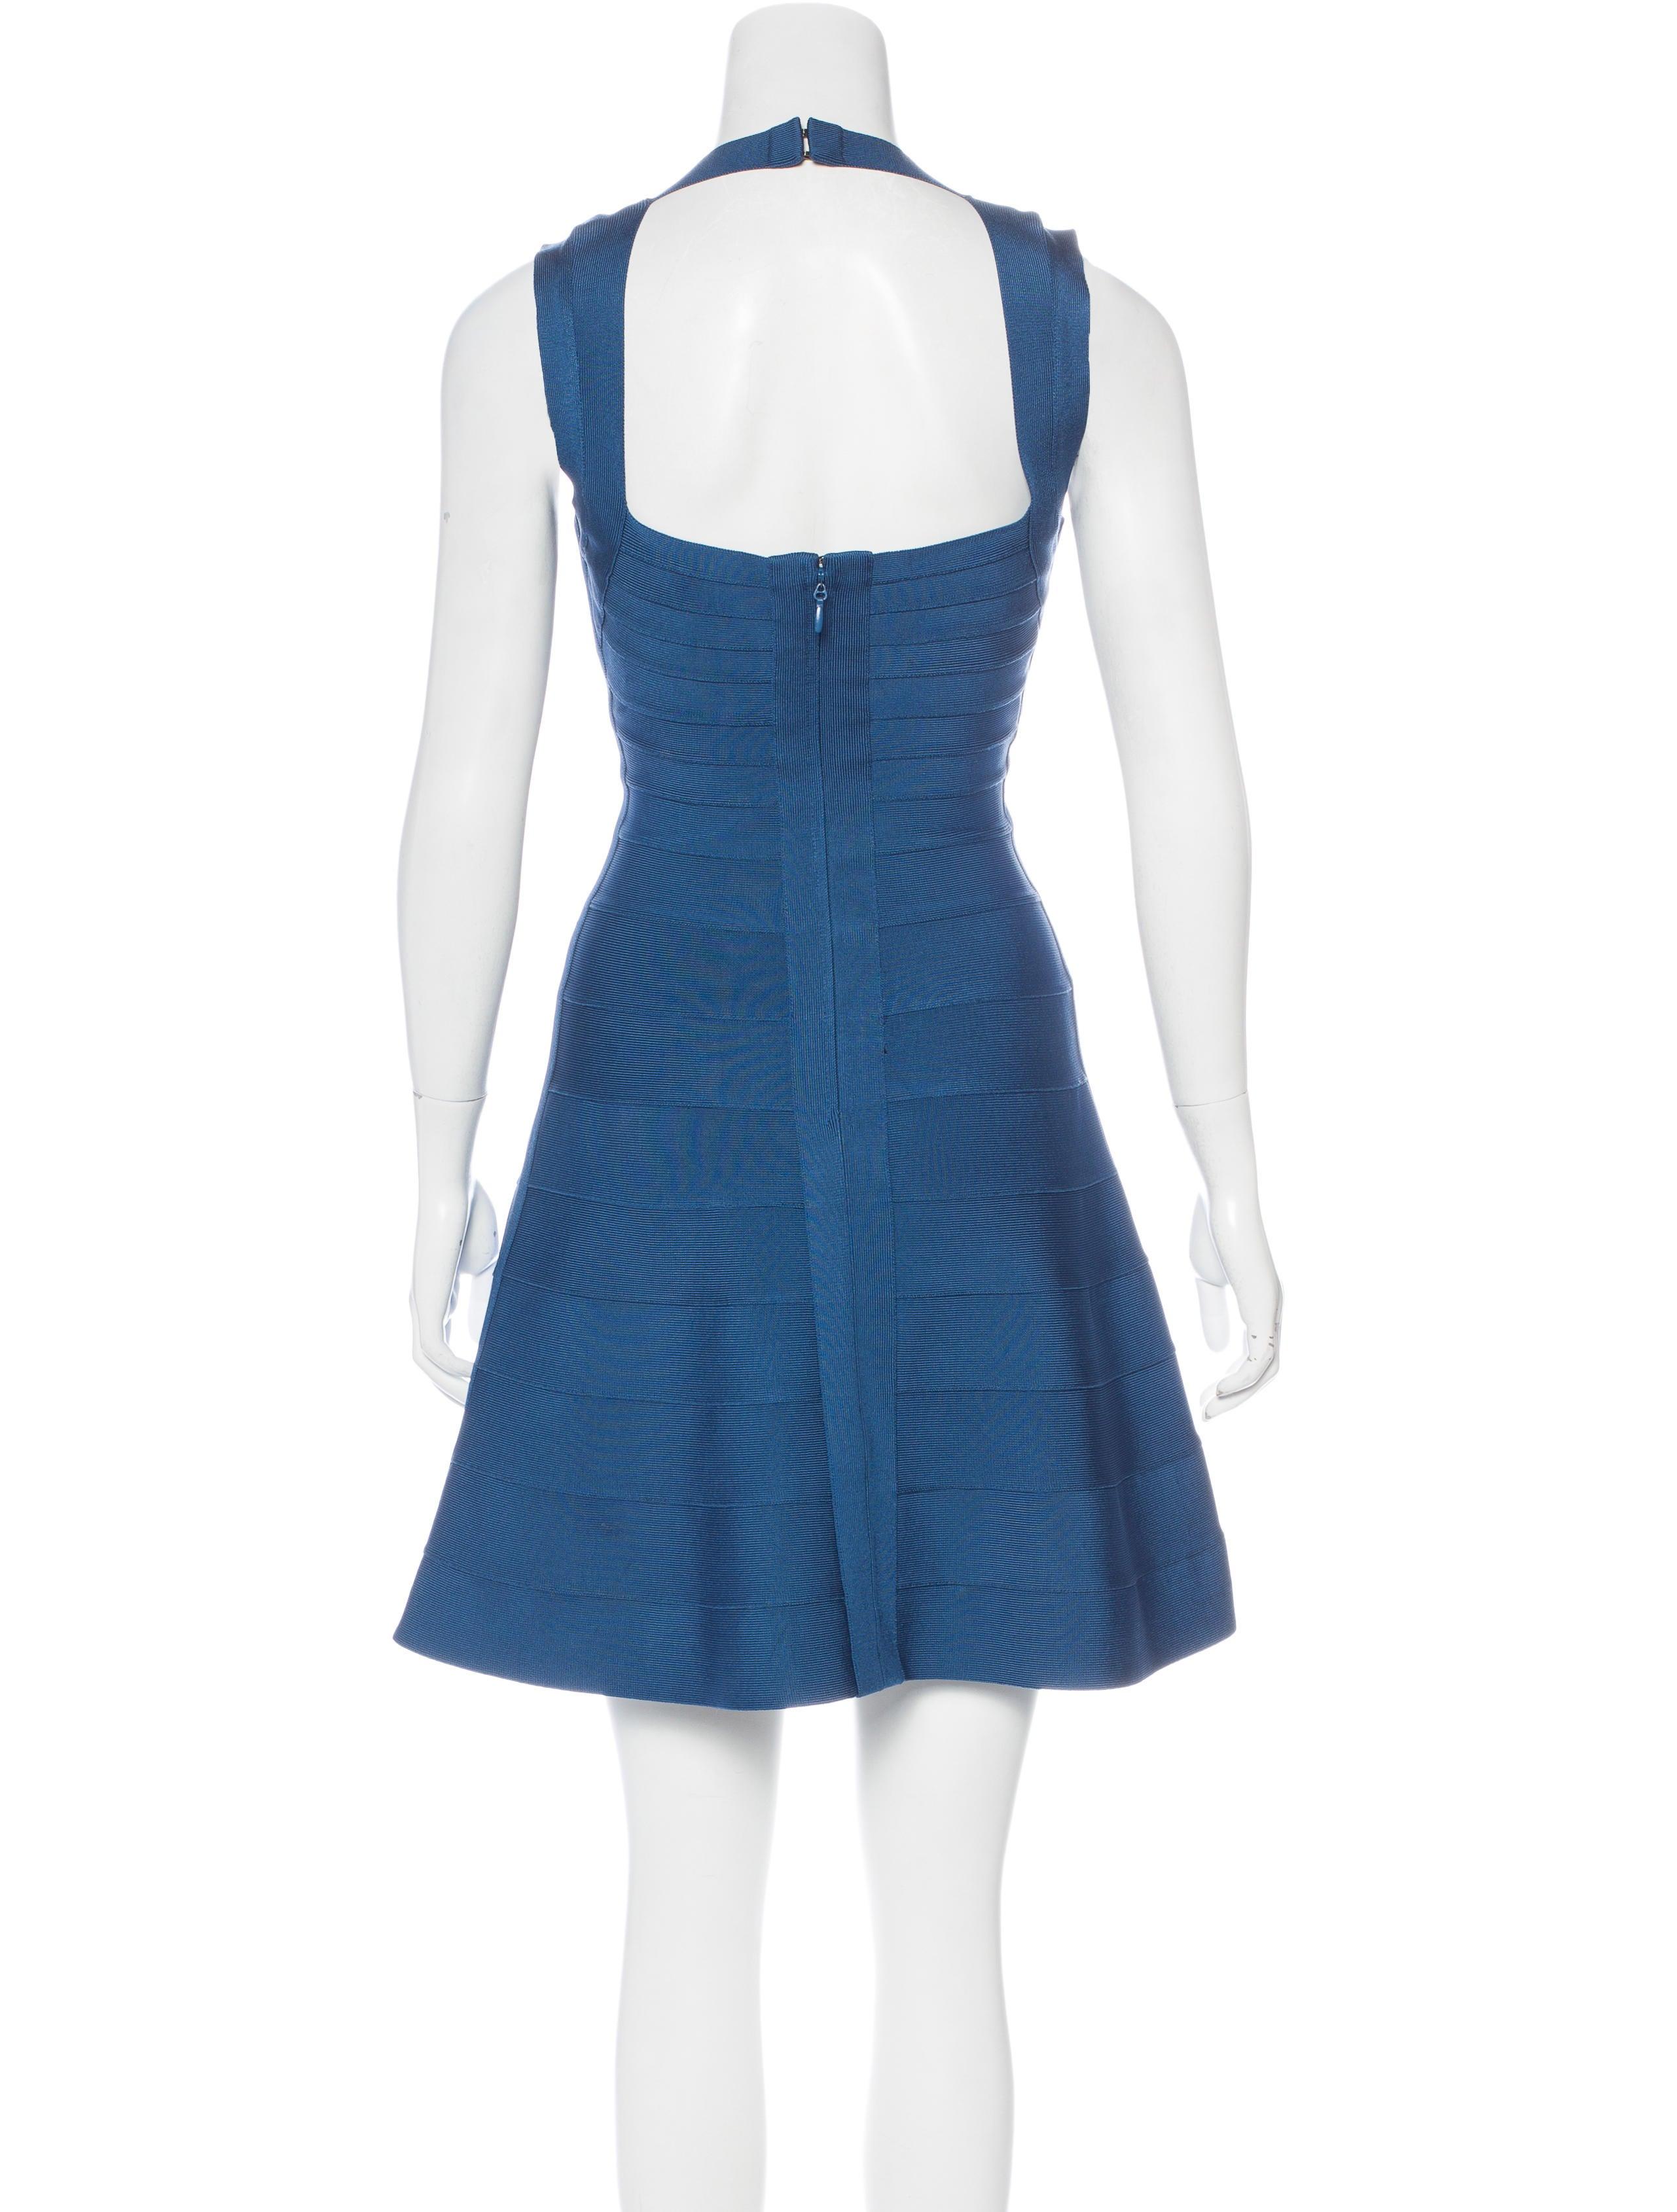 Herve Leger Bruna Bandage Dress - Clothing